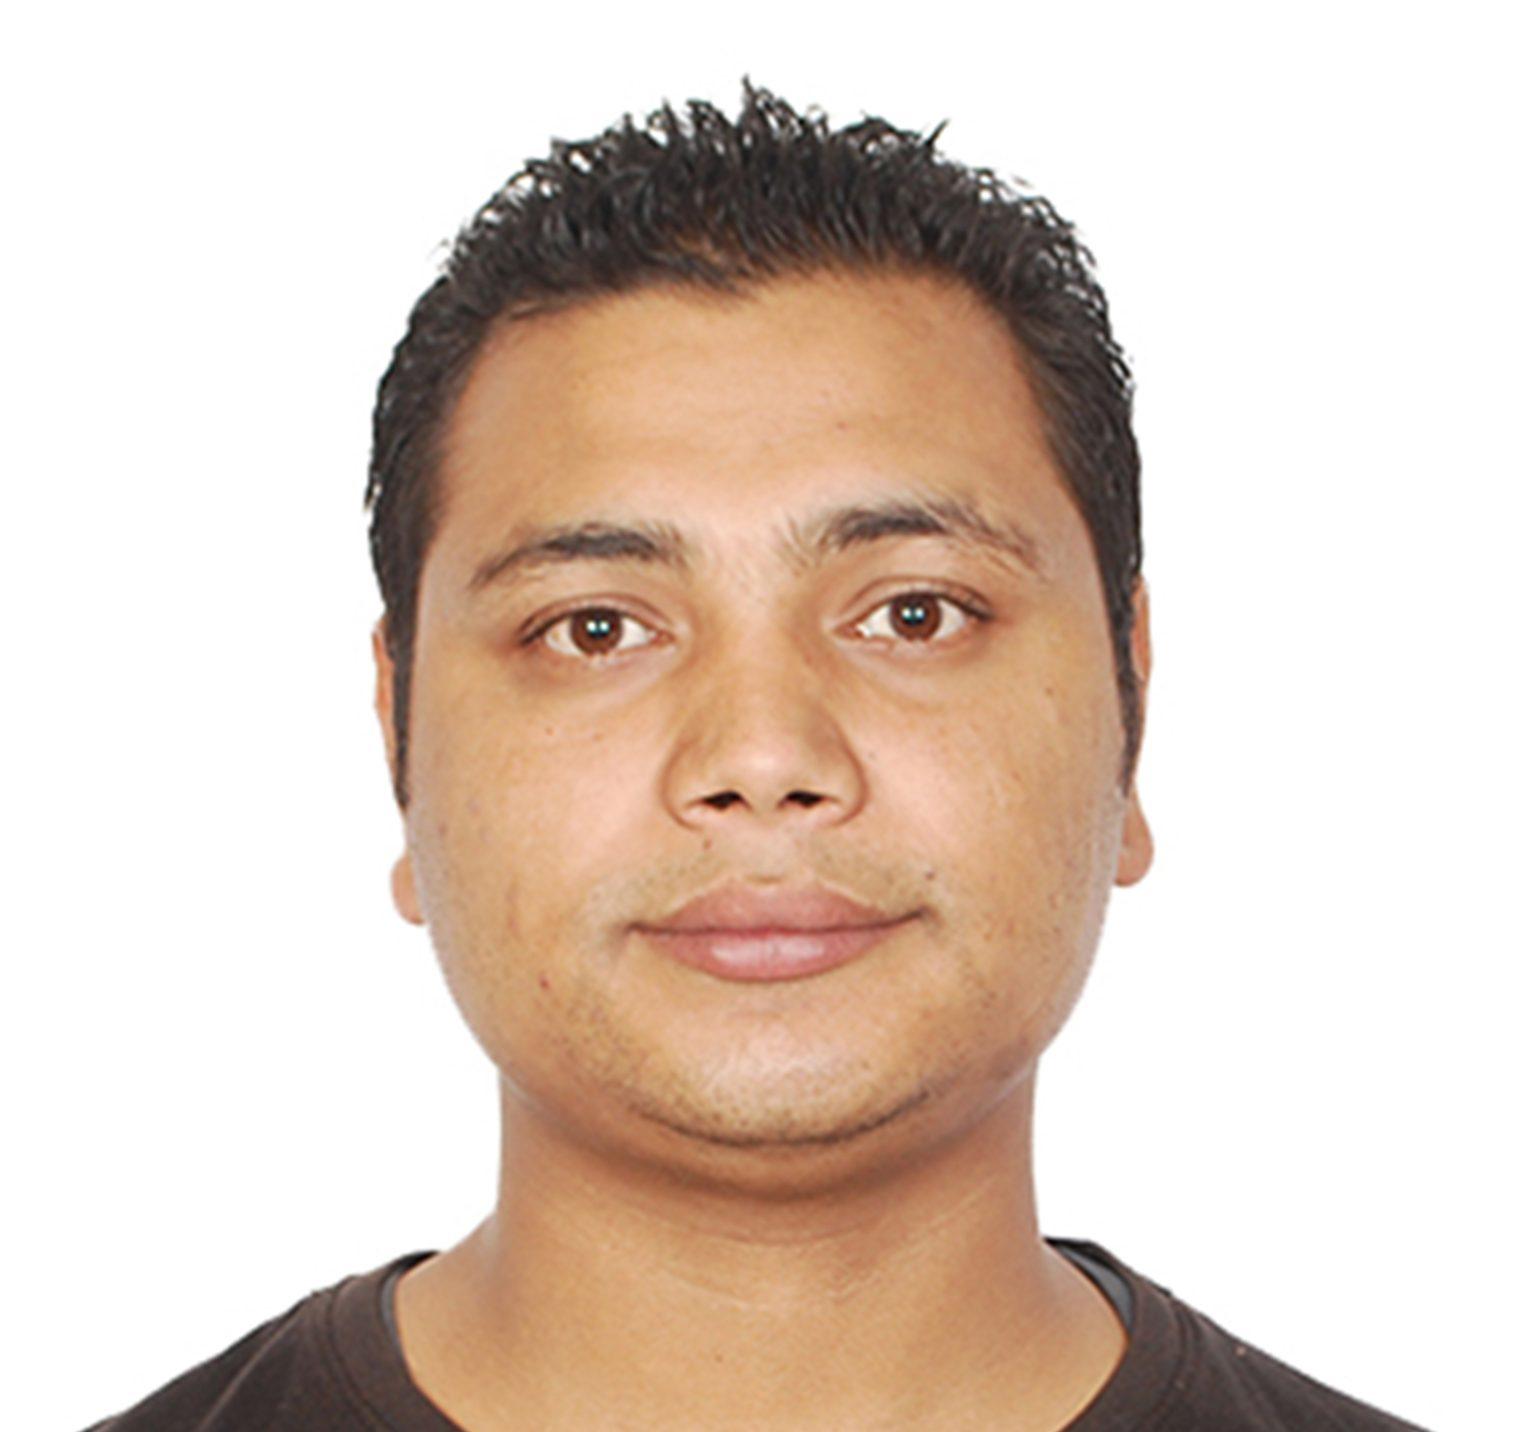 Mr. Birendra Prajapati